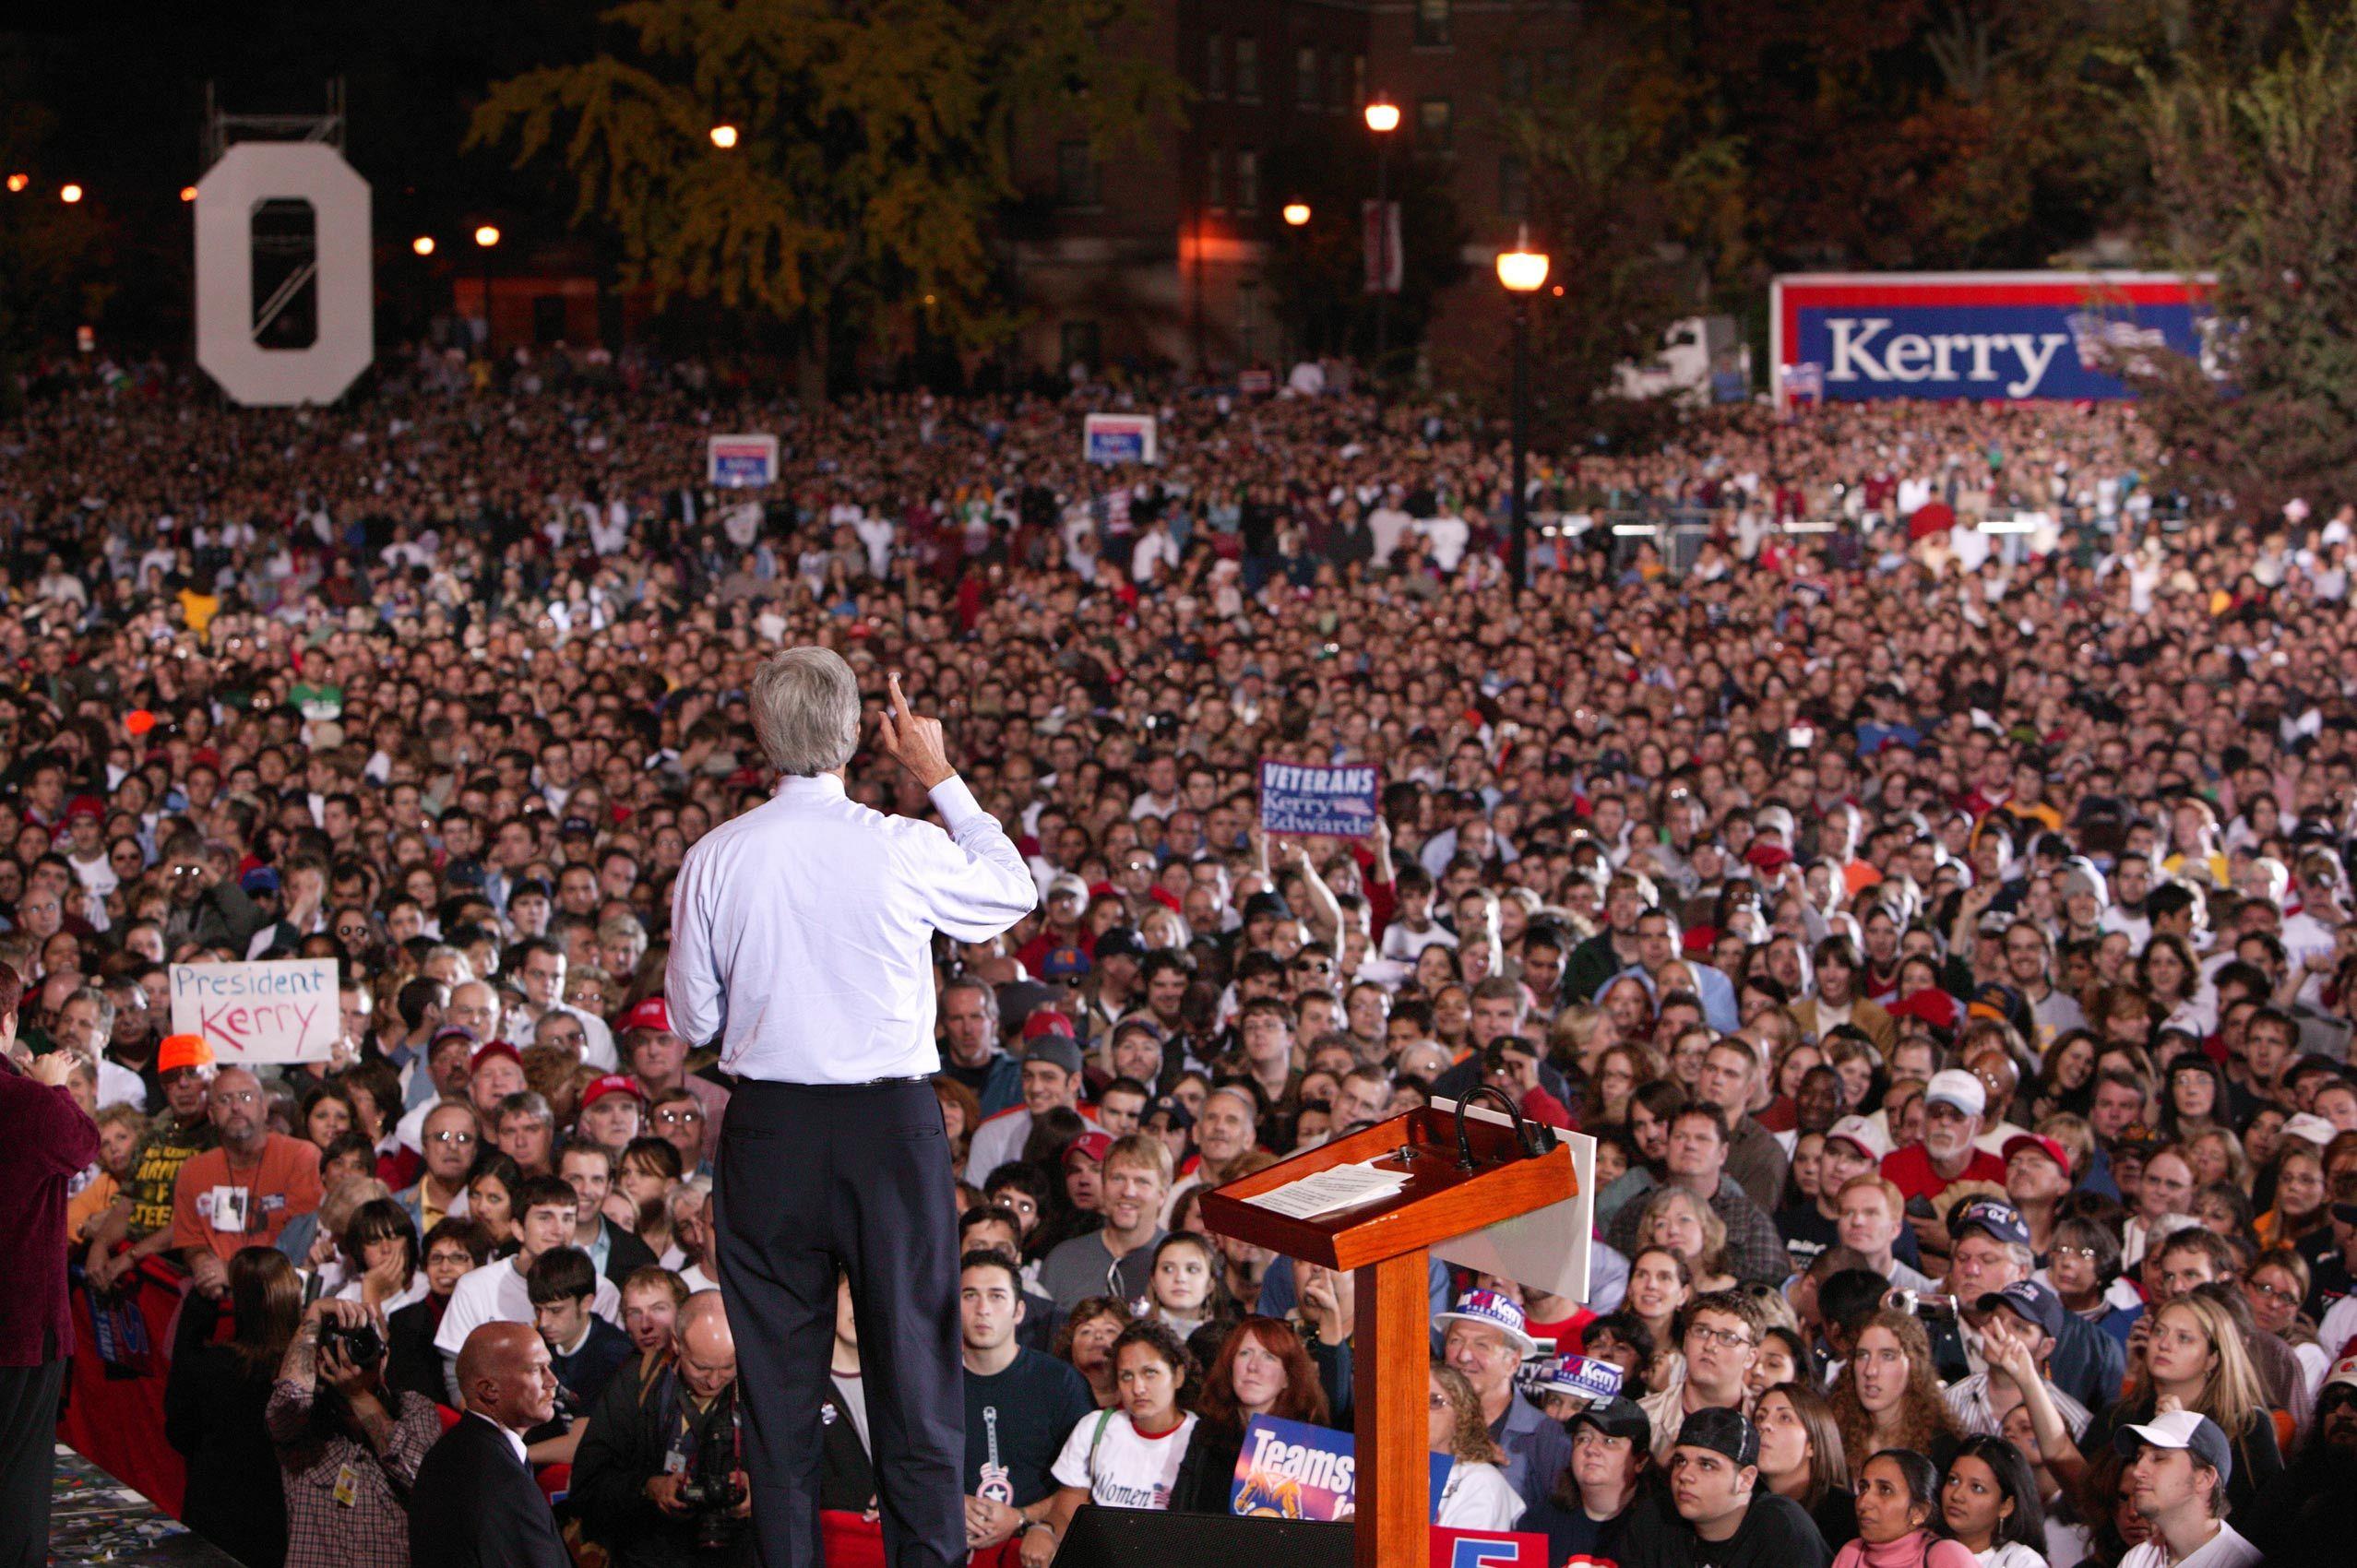 18-USA-Kerry-10.04.jpg